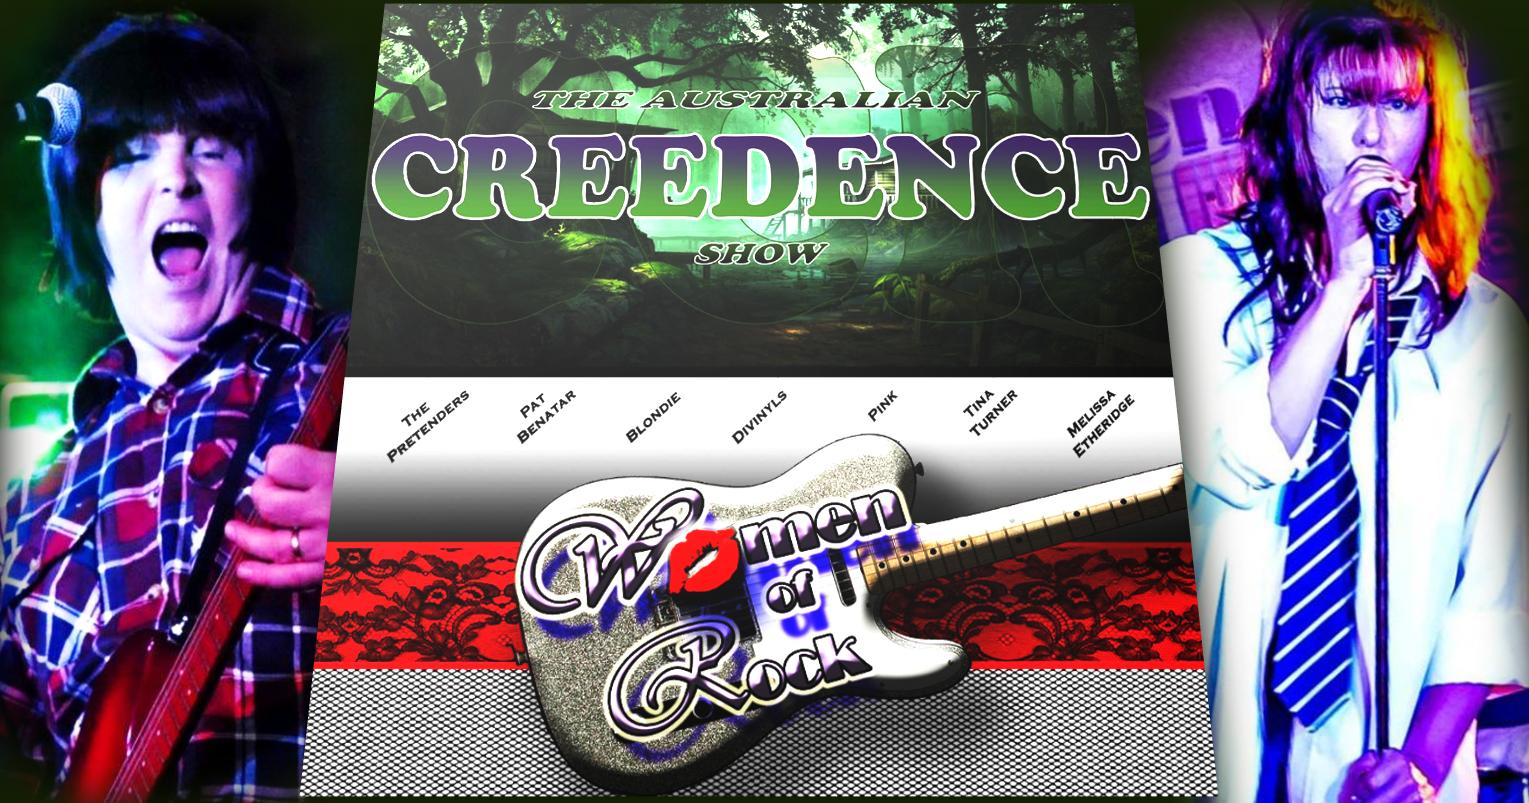 http://www.whirlwindent.com/promotional/UserUploads/CreedenceShowPlusWomenOfRock/FacebookfdaeZ.png